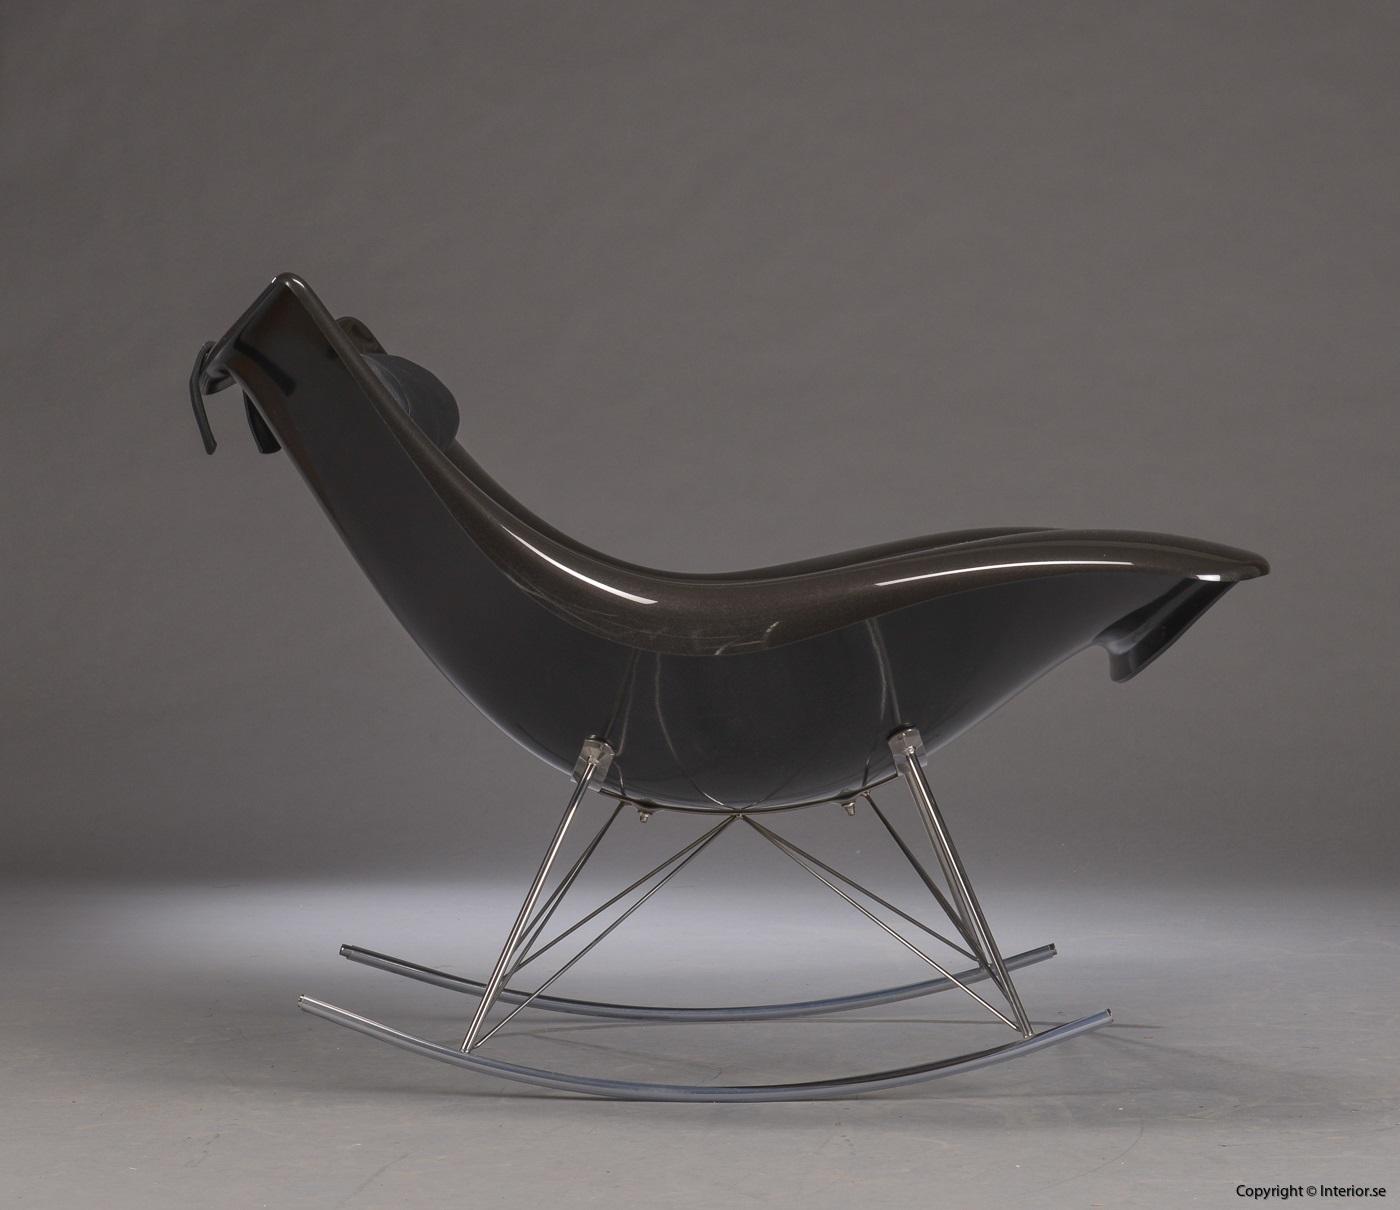 1 Gungstol, Fredericia Furniture Stingray - Thomas Pedersen Rocking chair, Schaukelstuhl (4)